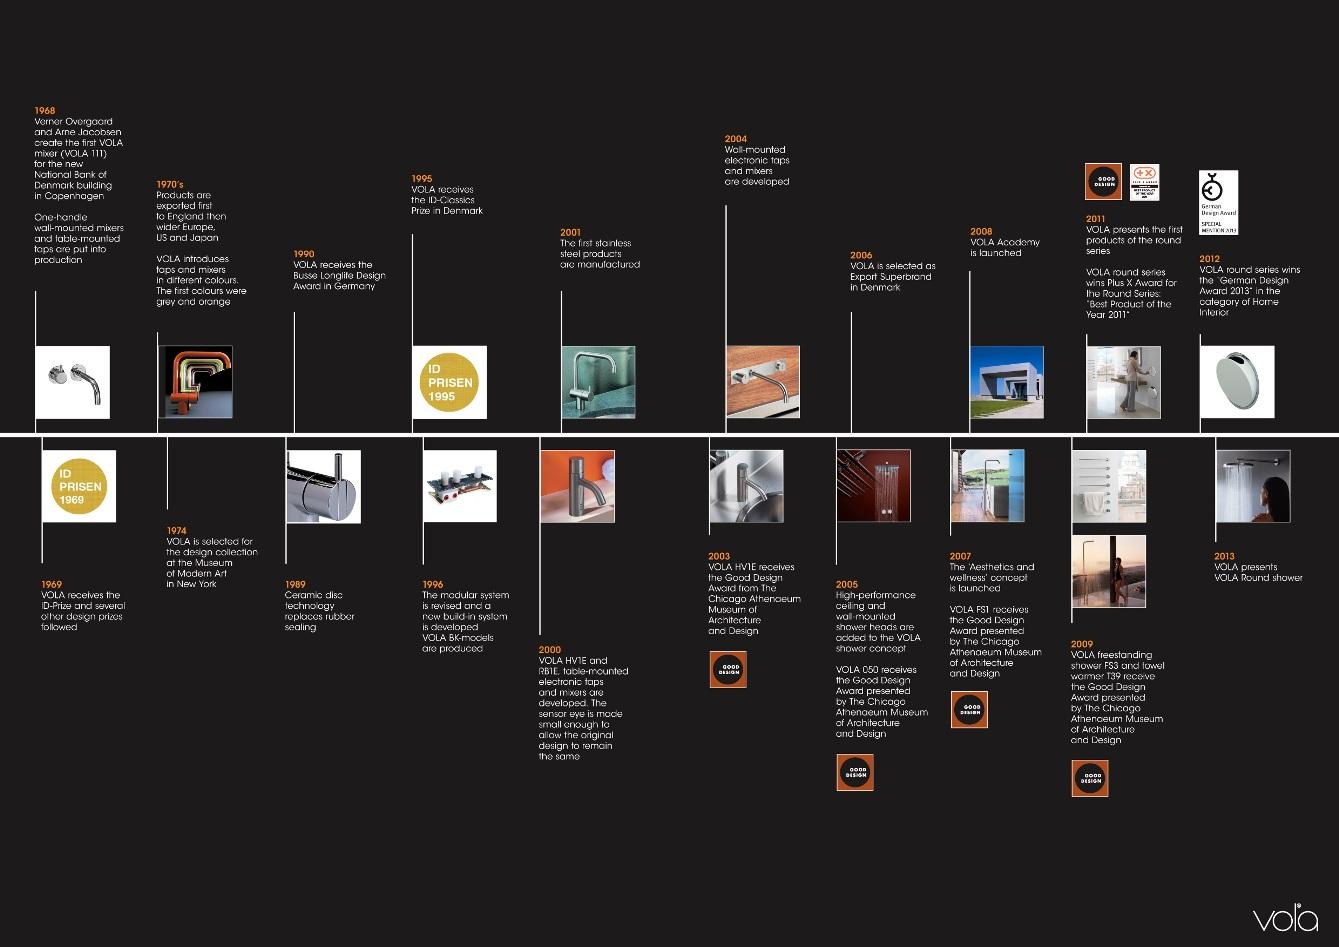 vola timeline2011